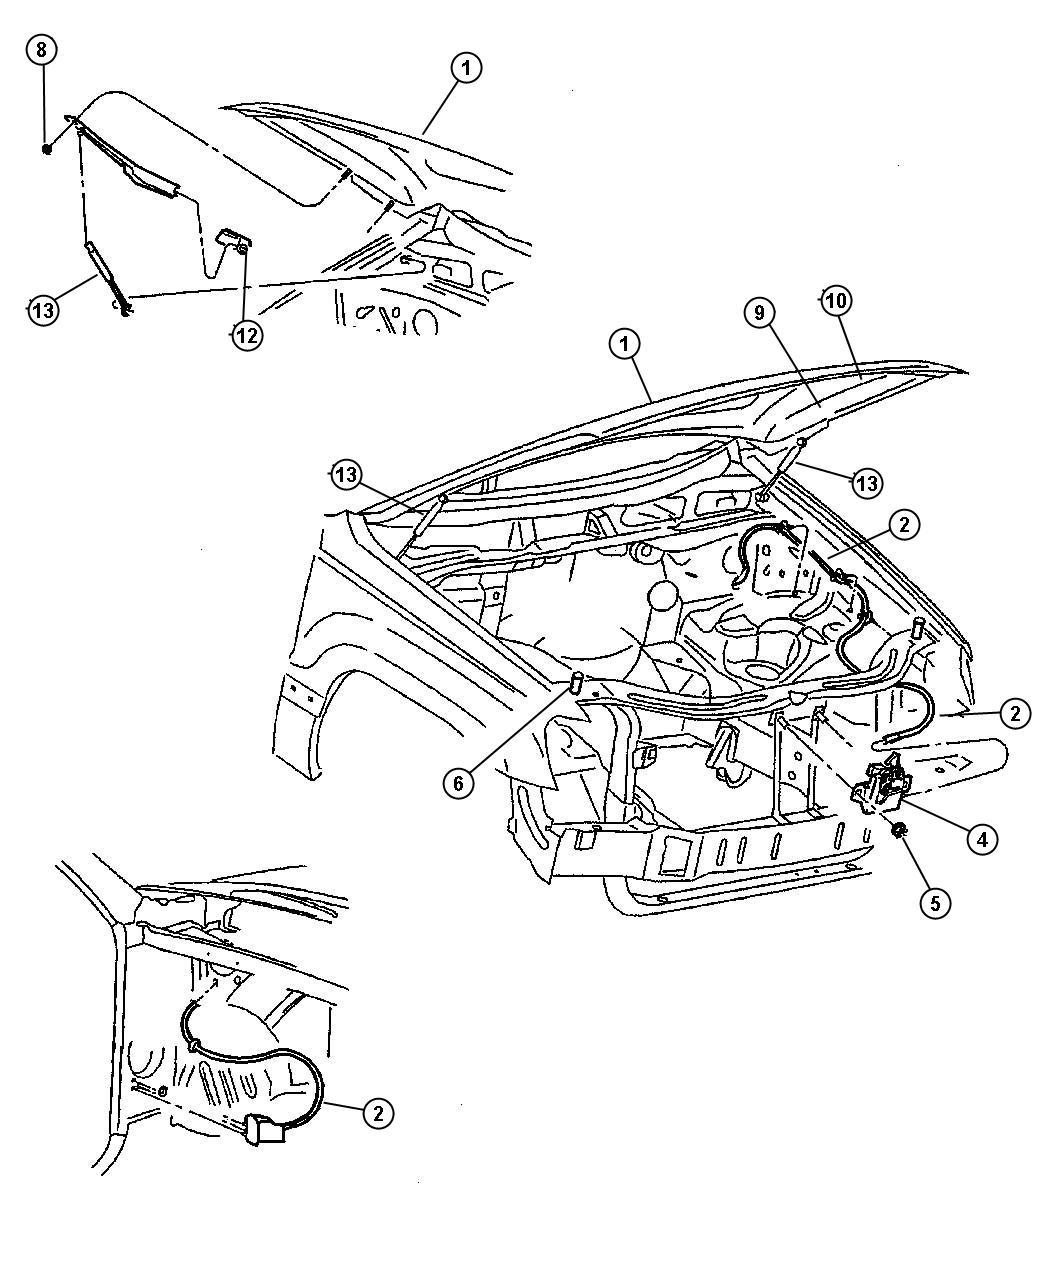 2002 Dodge Durango Cable Hood Release Front Suspension